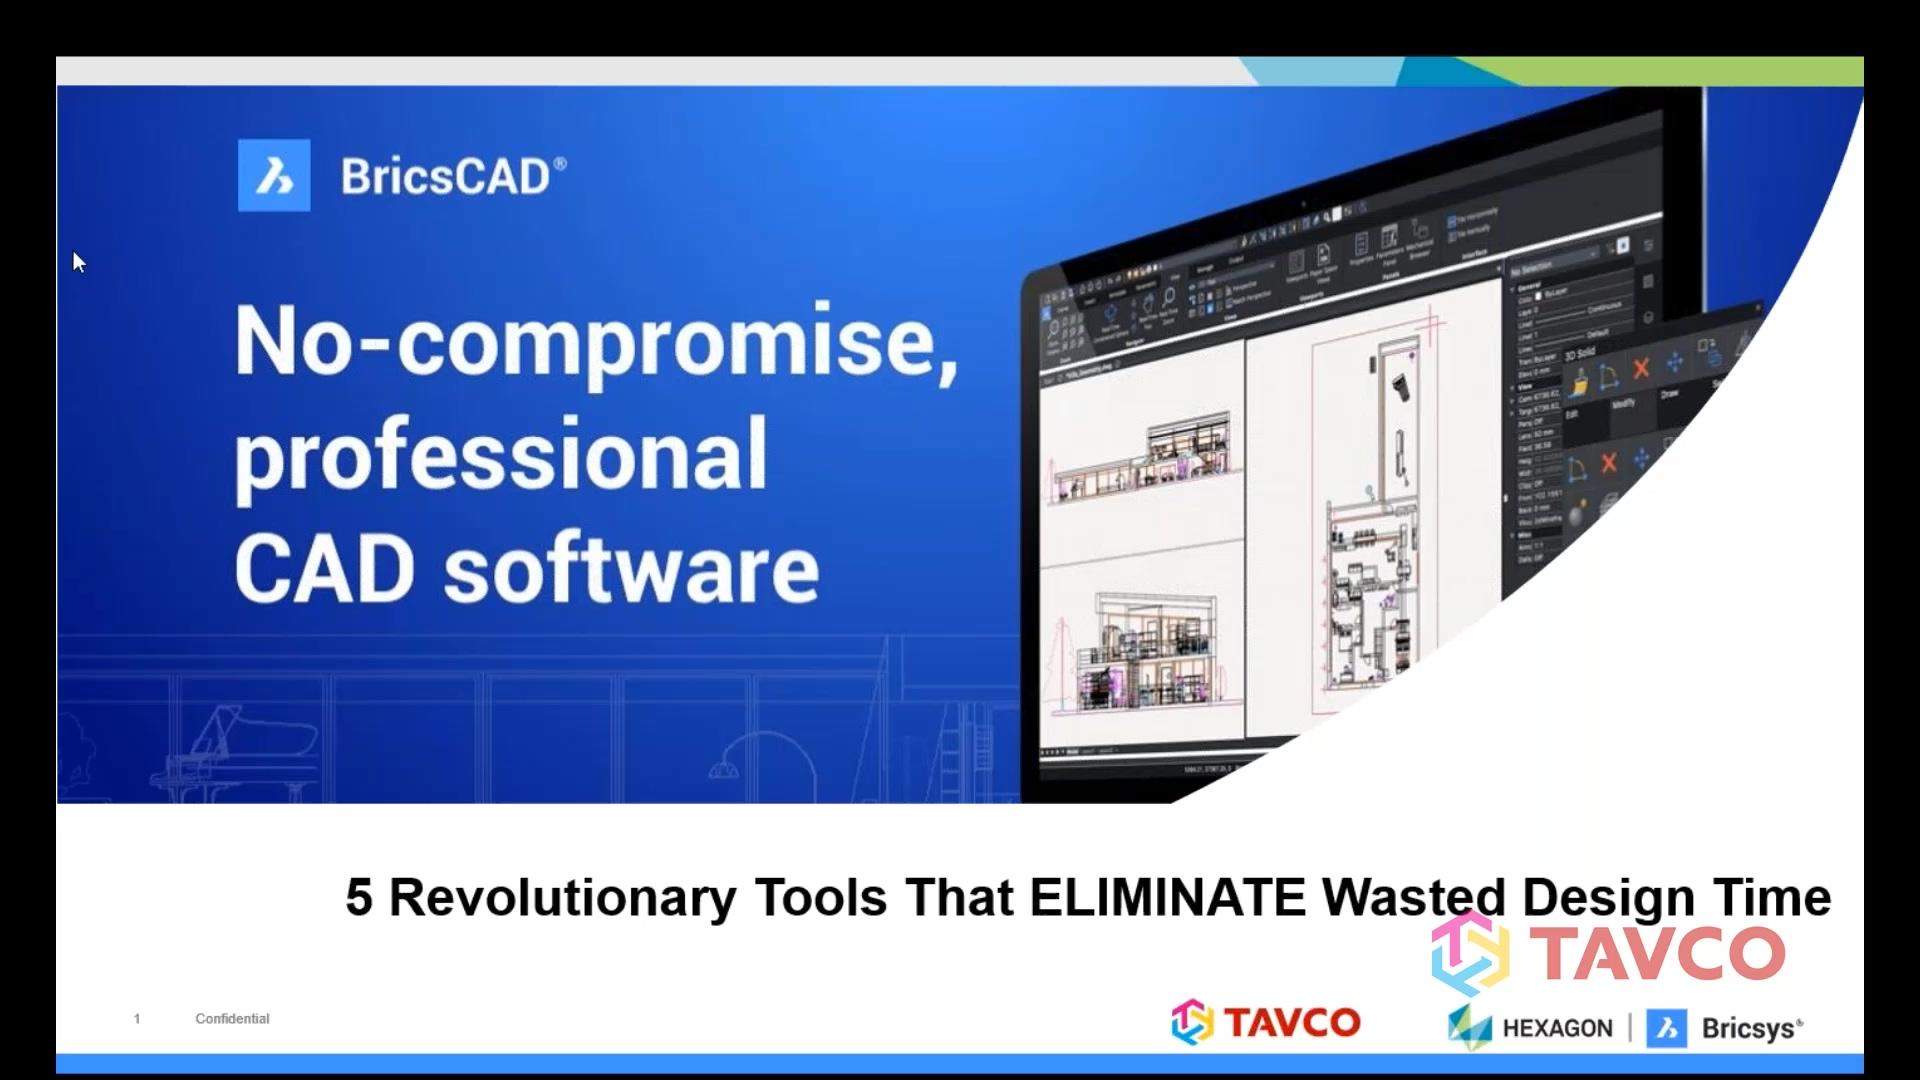 Webinar - 5 Revolutionary BricsCAD Tools that Eliminate Wasted Design Time